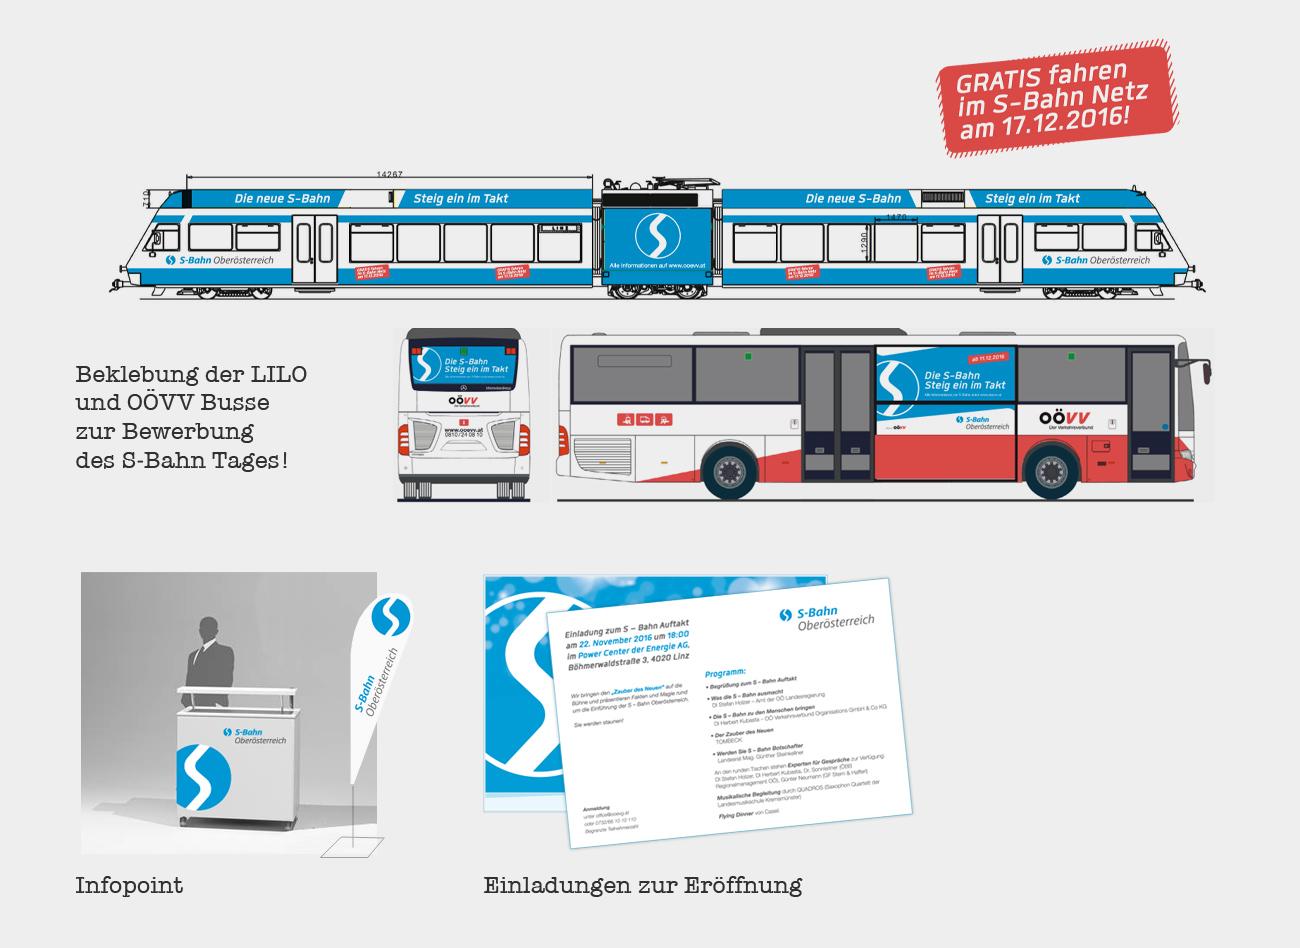 S-Bahn Oberösterreich / Diverses